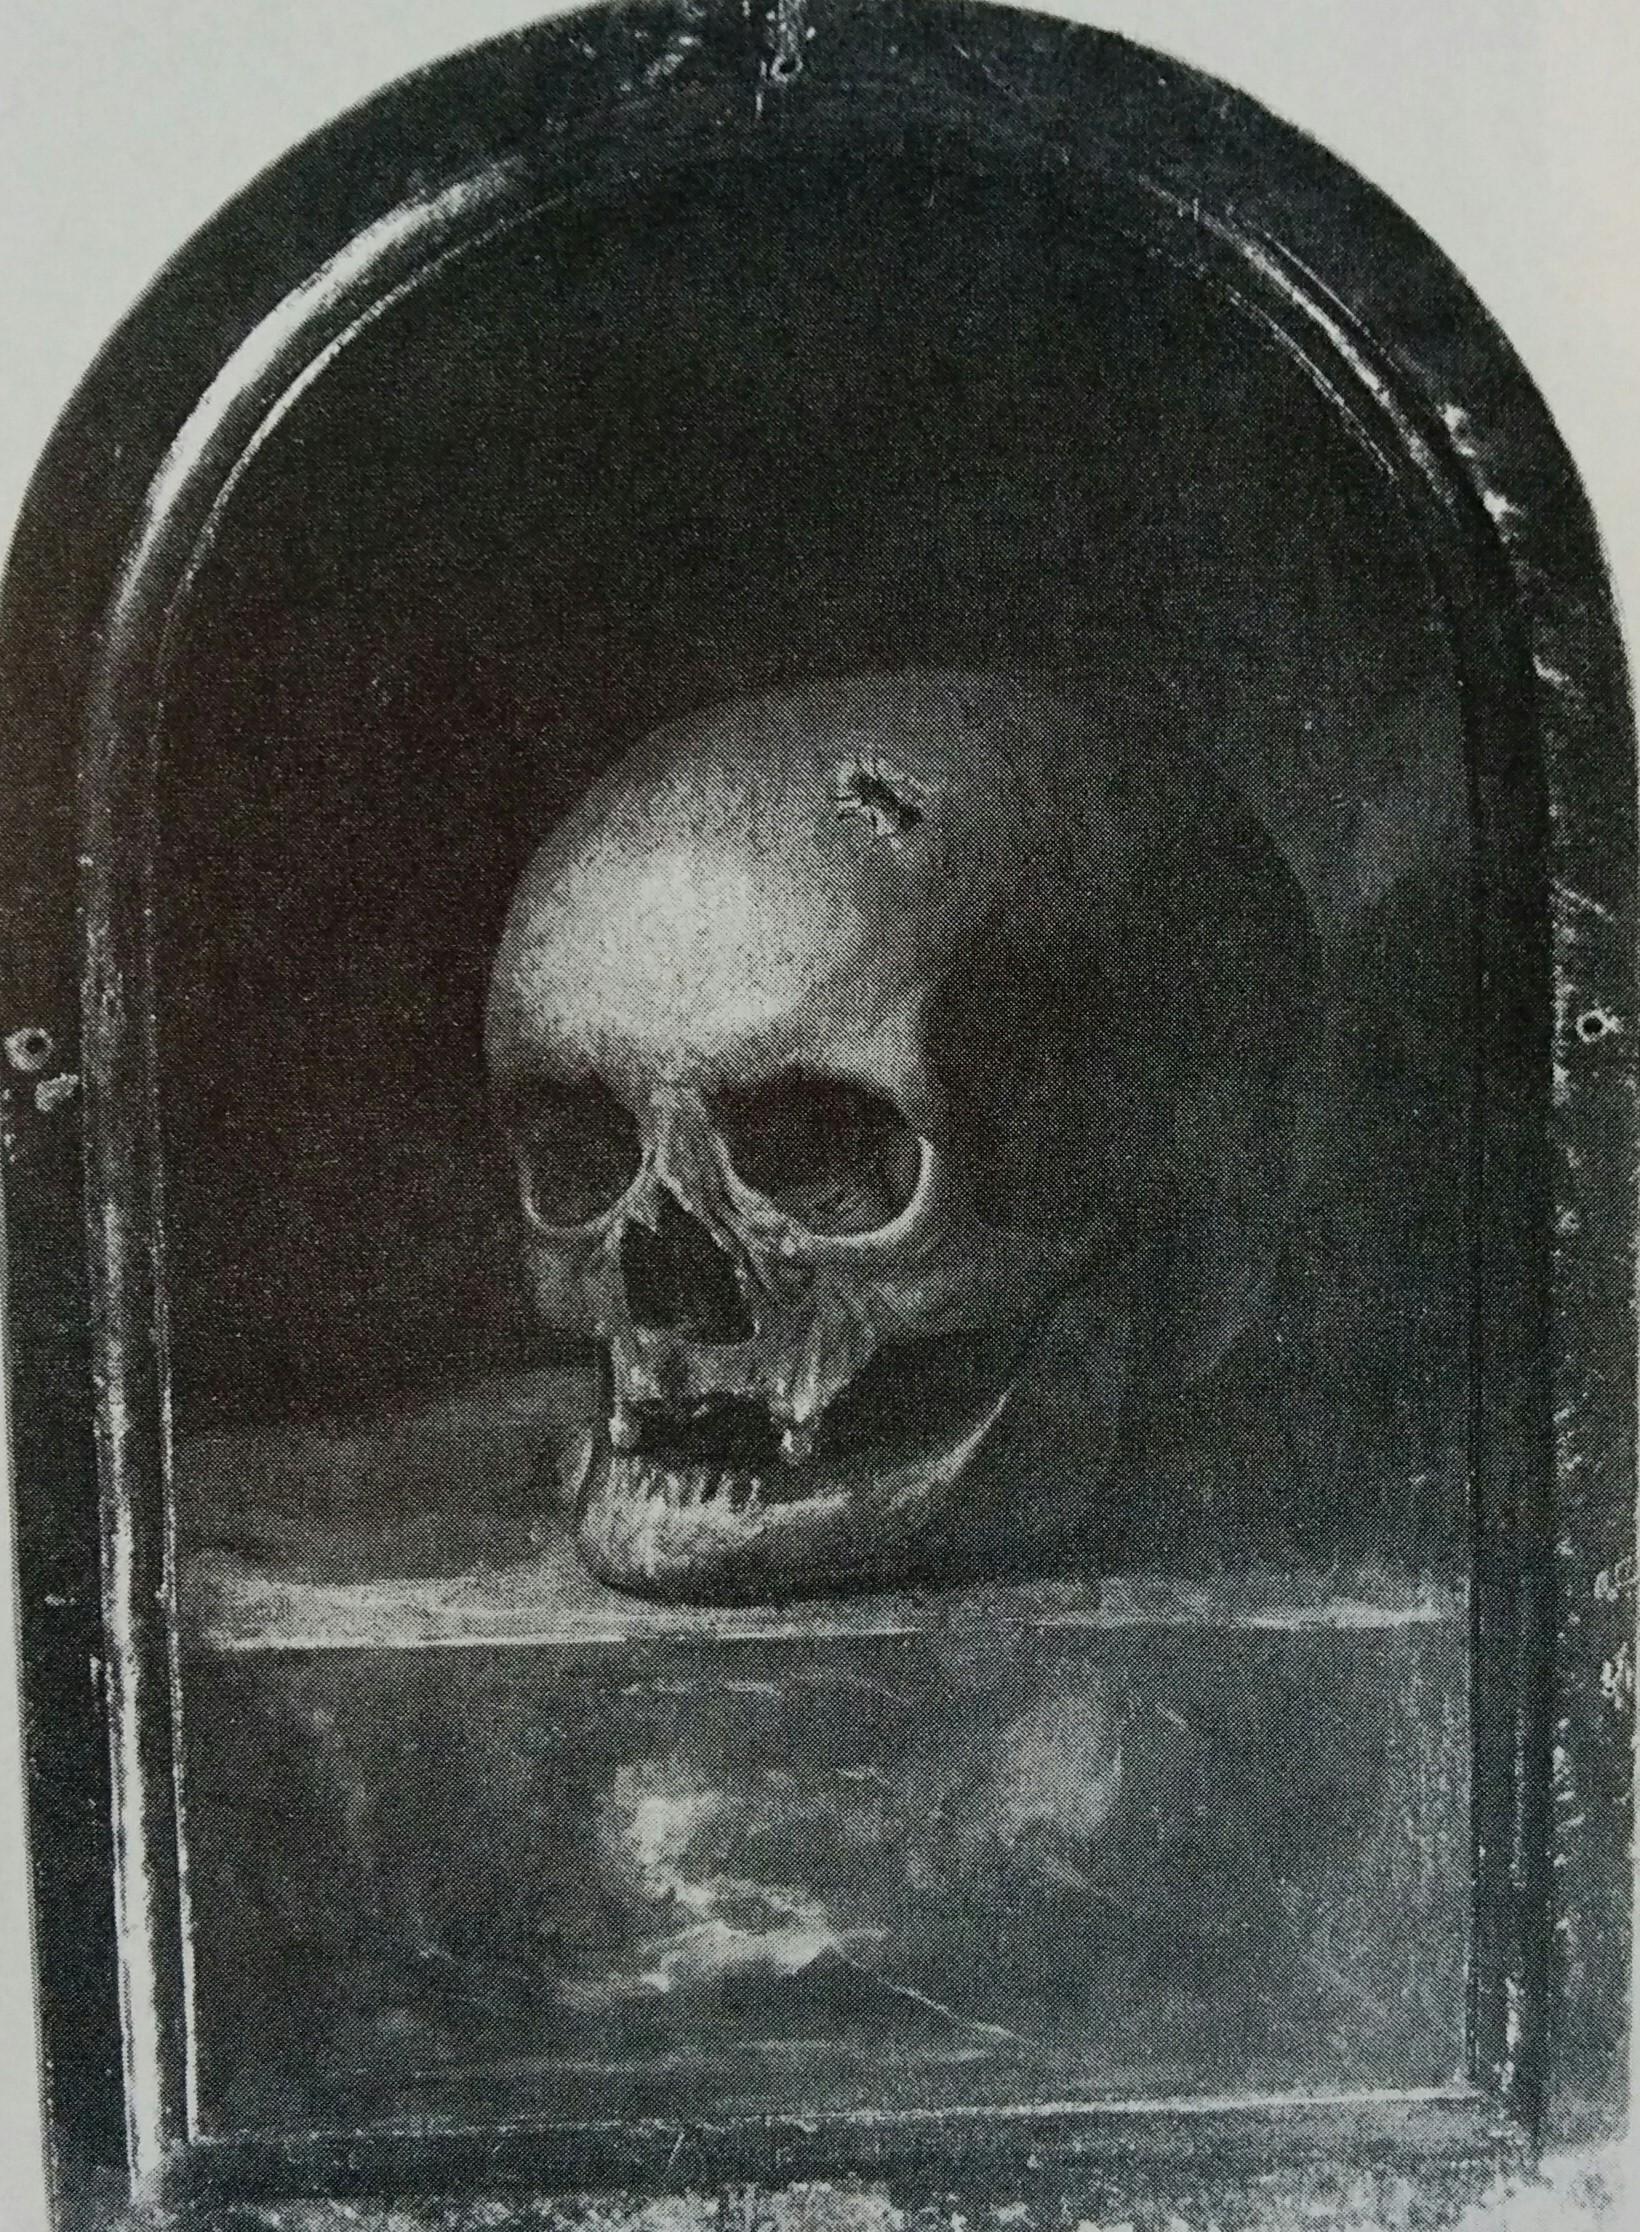 Barthel Bruyn l'Ancien 1517 revers portrait feminin coll privee